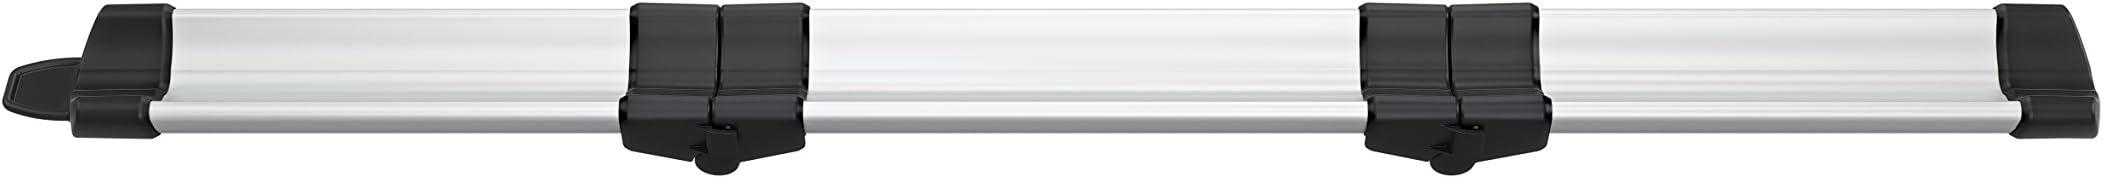 Thule 933400 Foldable Loading Ramp